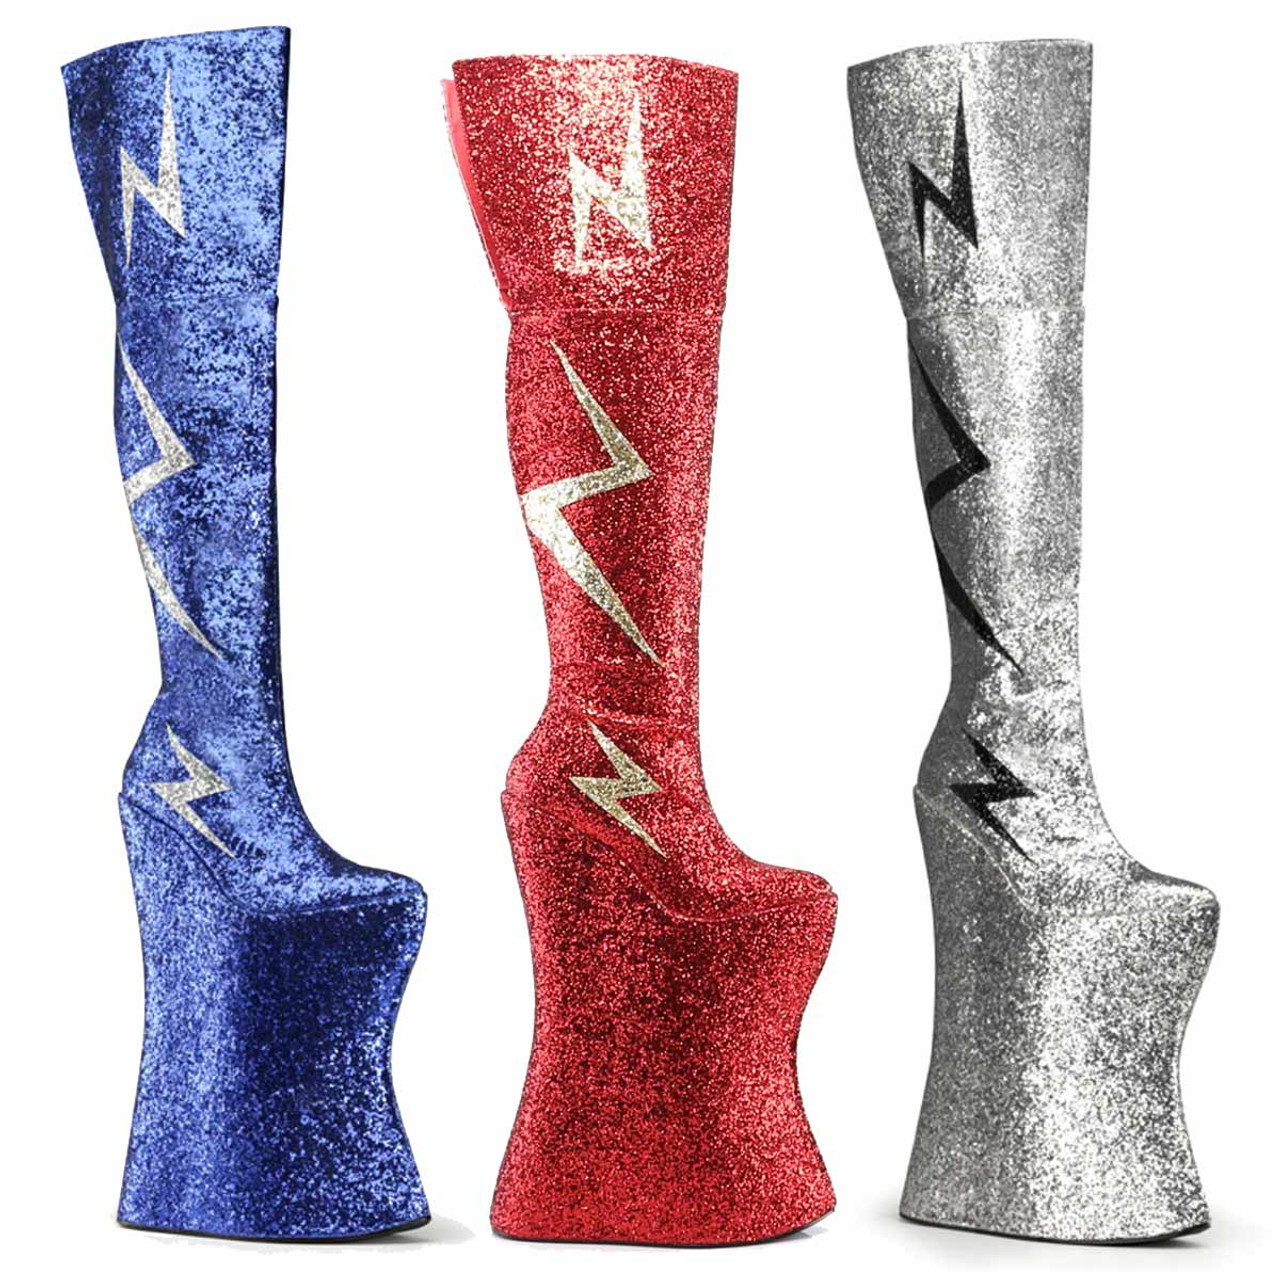 Devious VIVACIOUS-3016 Women/'s 13 1//2 Inch Heel 10 Inch Platform Thigh Boot